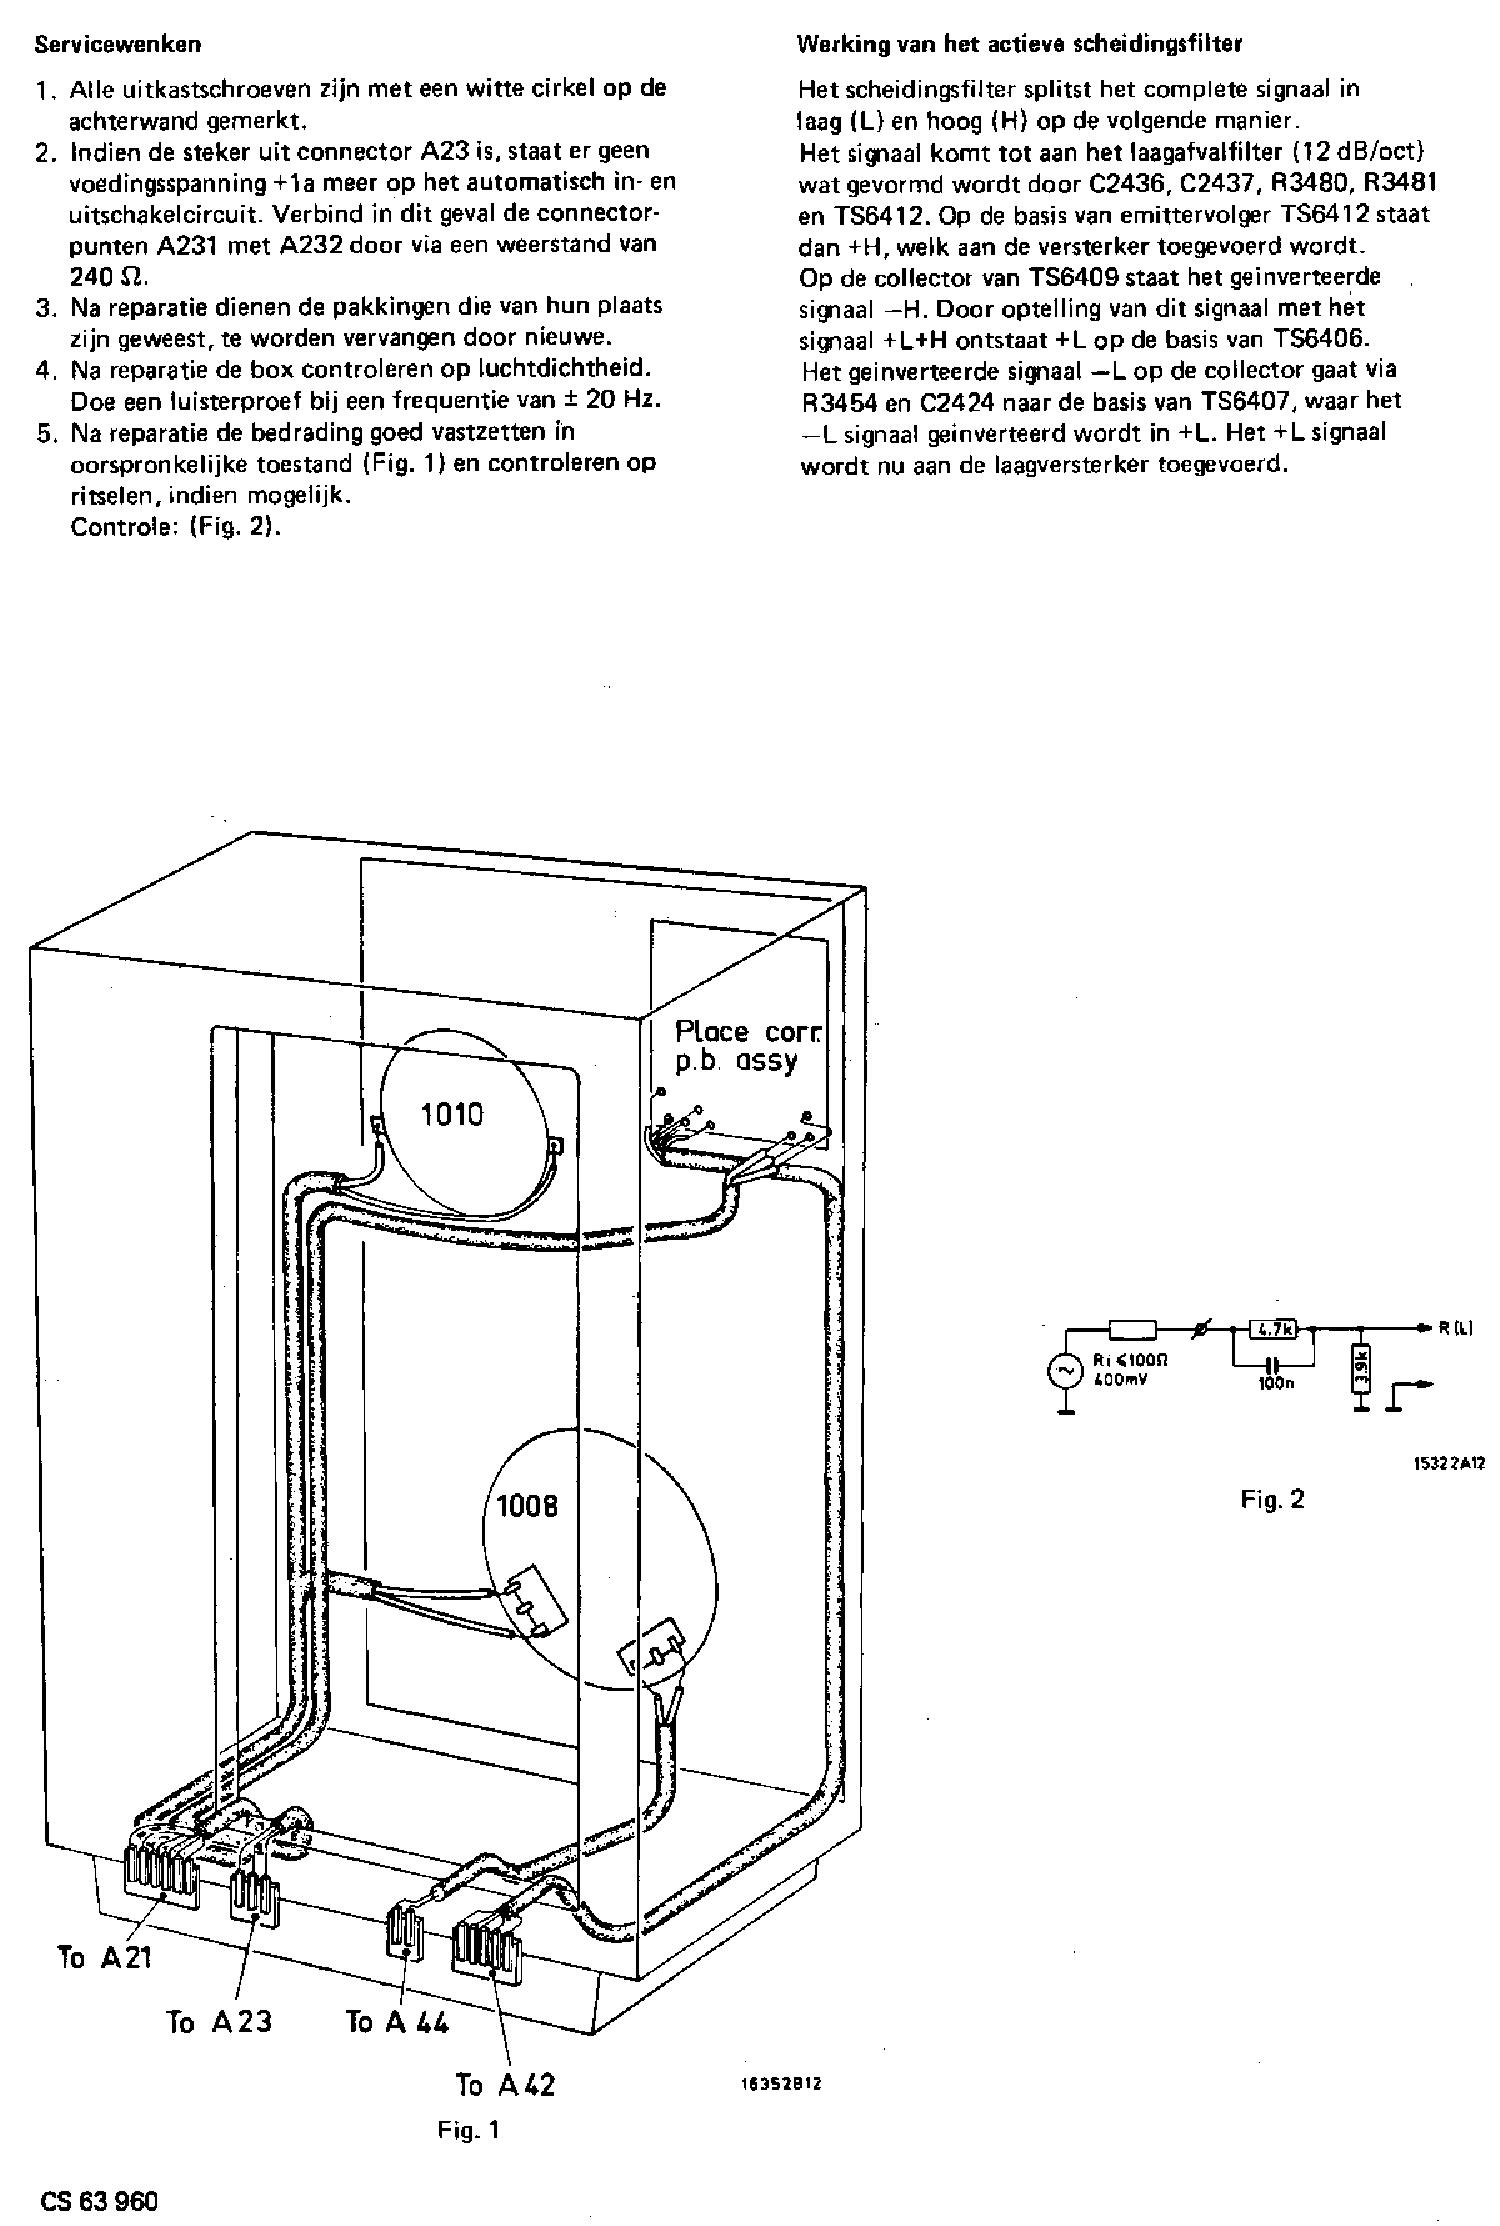 PHILIPS 22AH586-00-15-29 HIFI ACTIVE BOX SM Service Manual